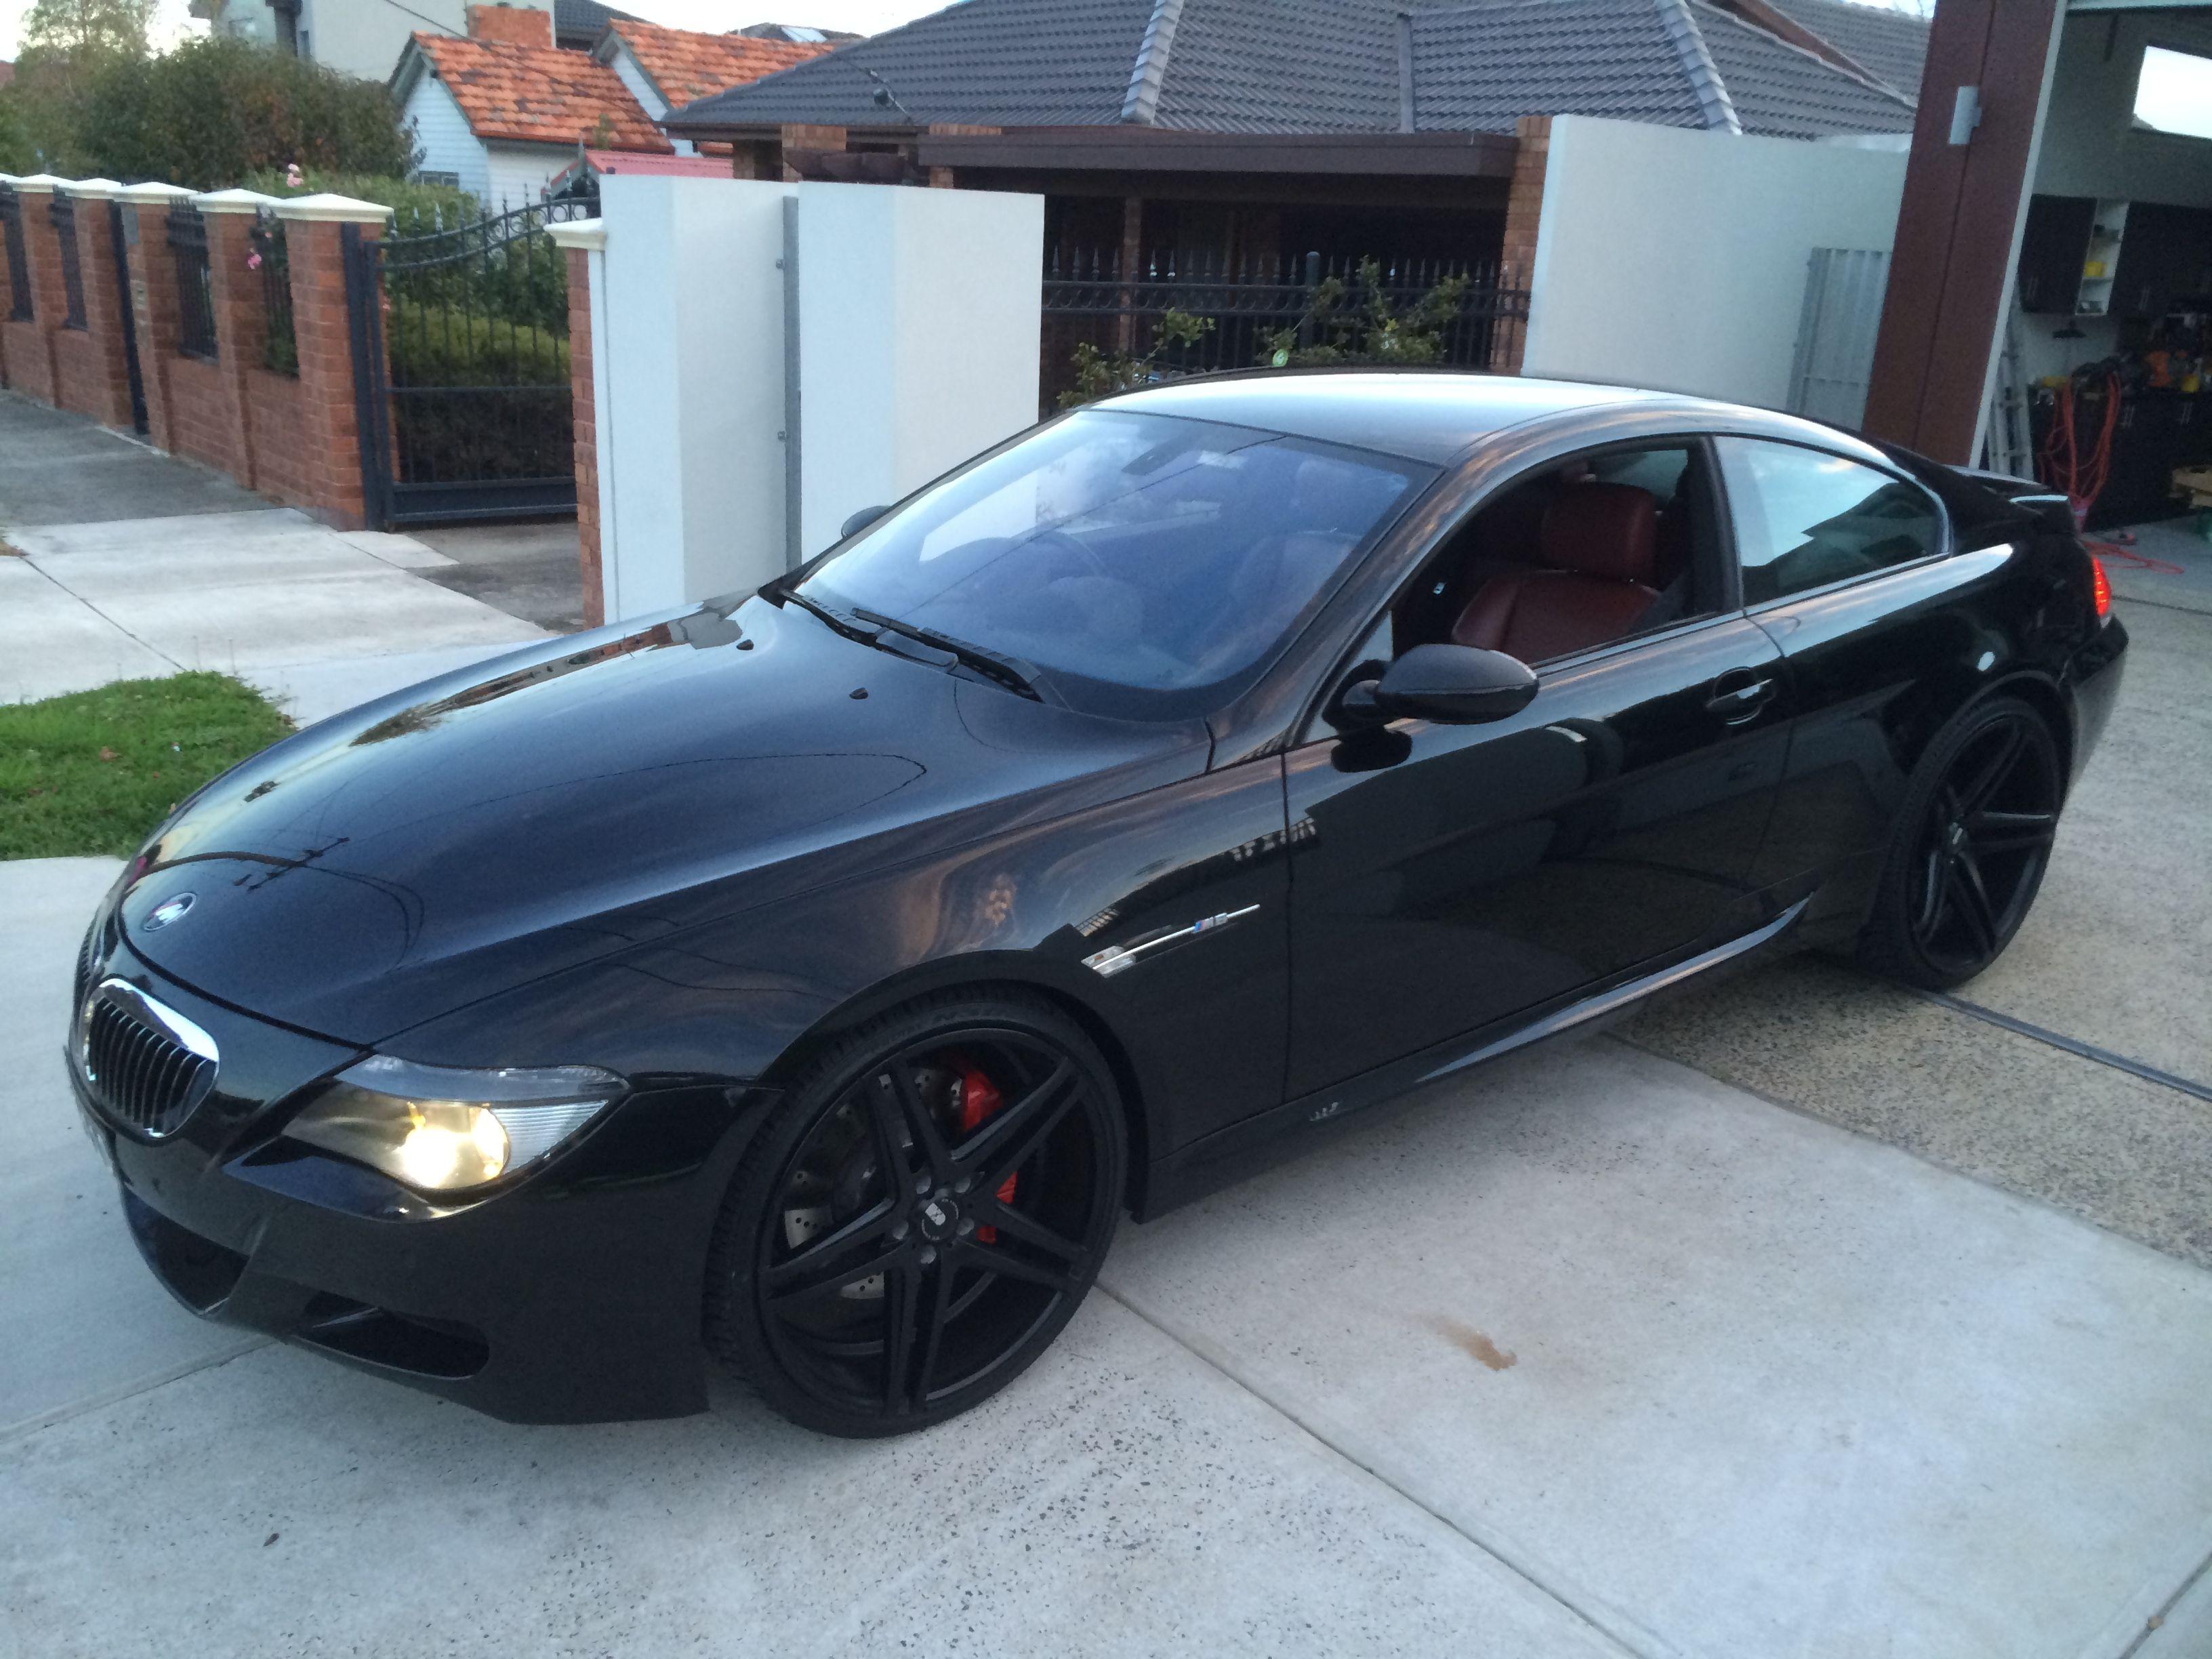 My Black Bmw M6 Whataf Machine Black Wheels 22 Inch With